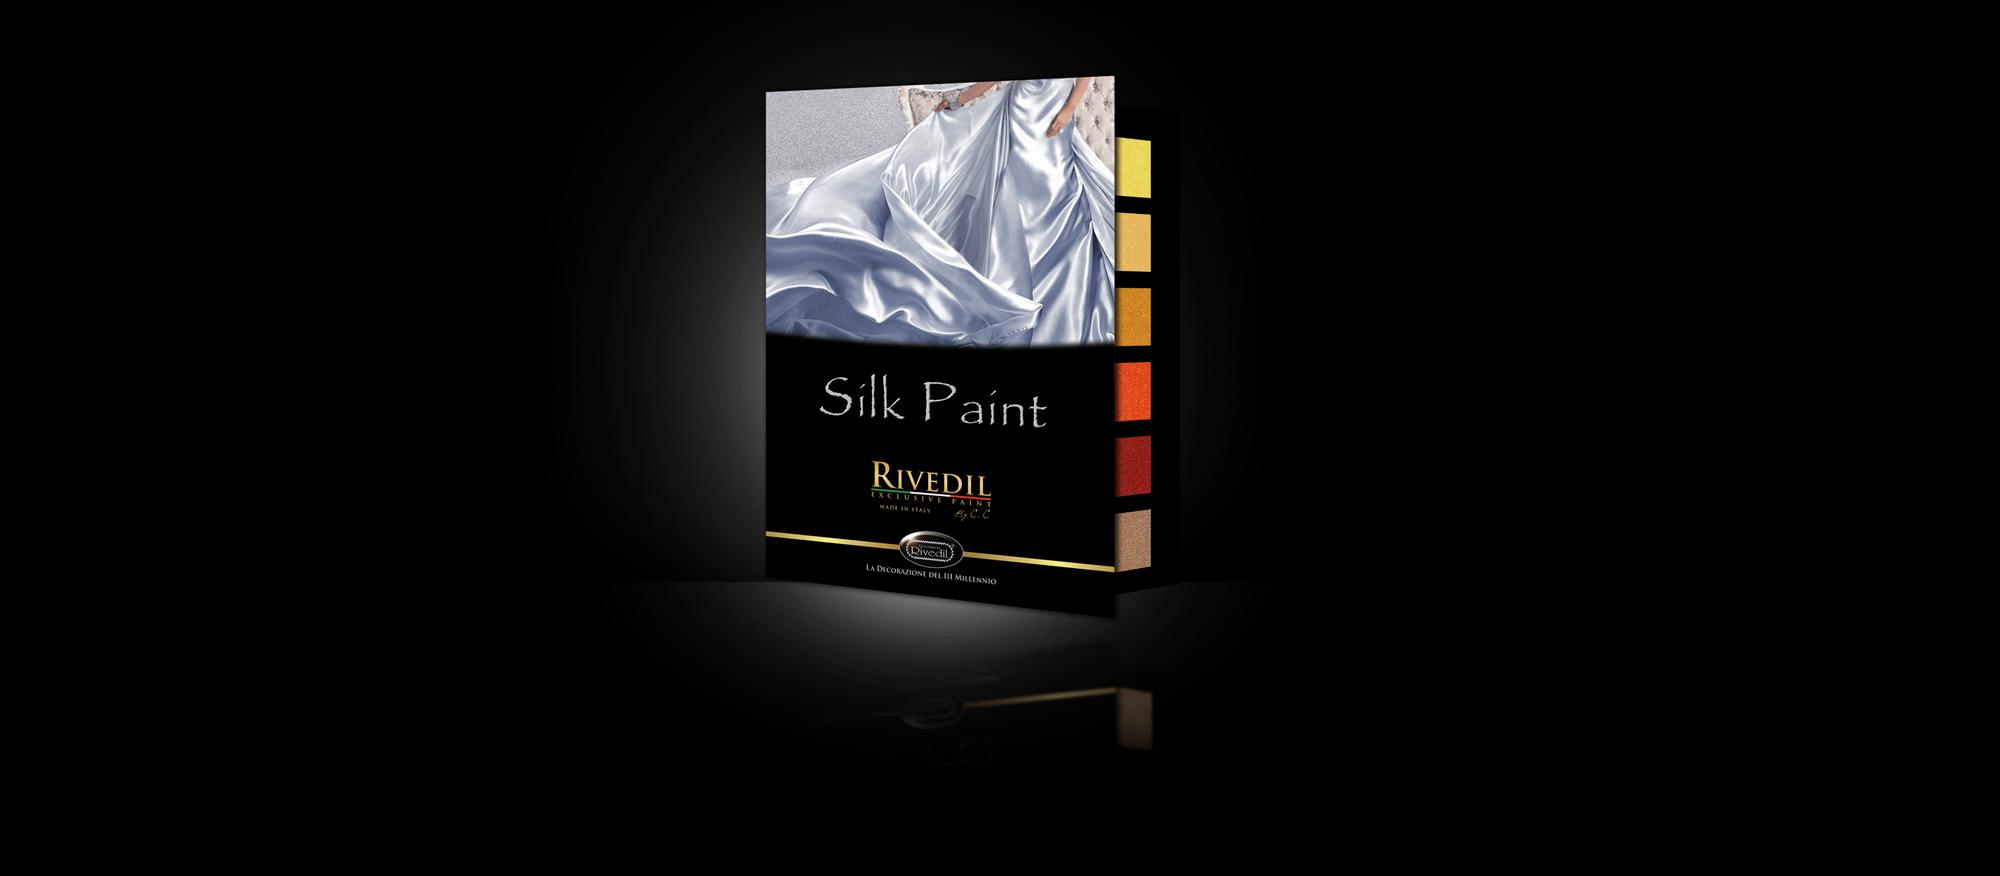 Cartella Silk Paint